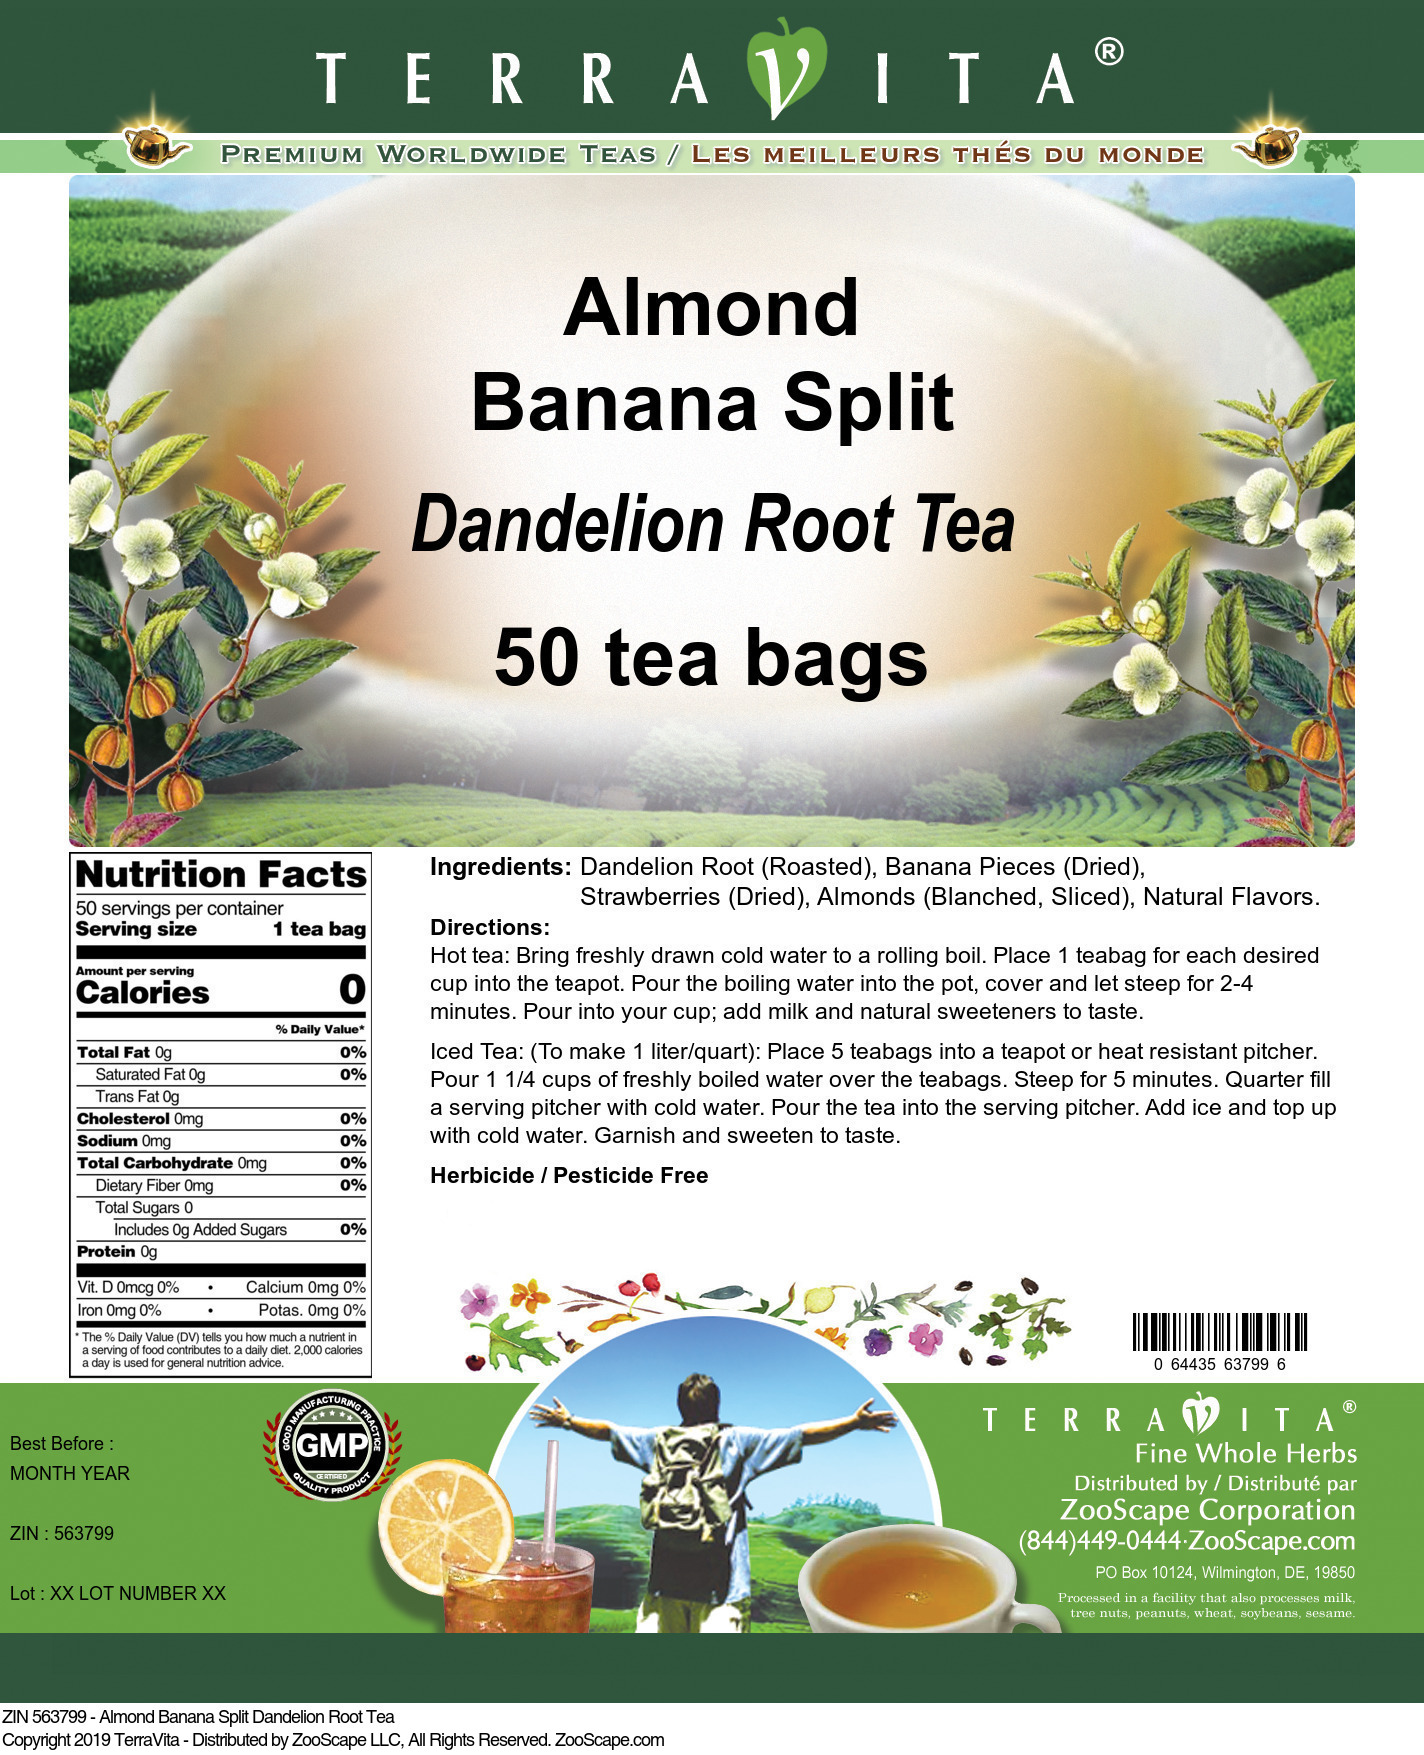 Almond Banana Split Dandelion Root Tea